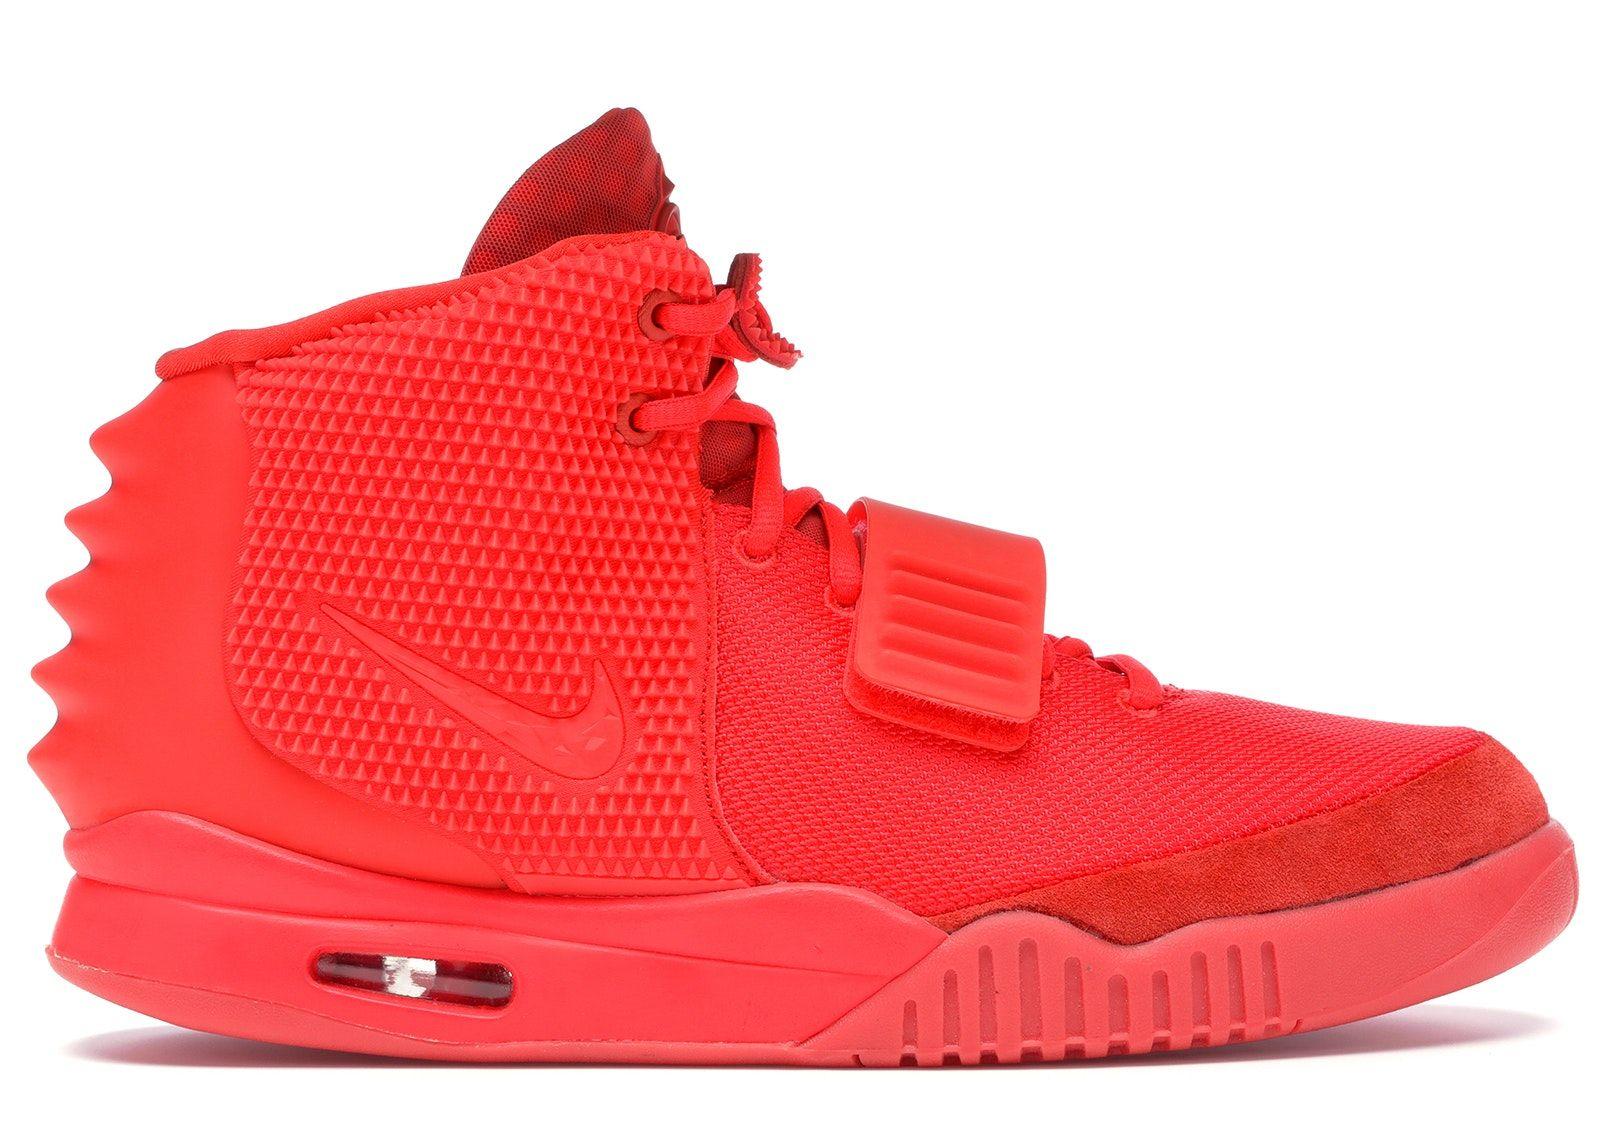 Nike Air Yeezy 2 Red October In 2020 Air Yeezy Yeezy 2 Red